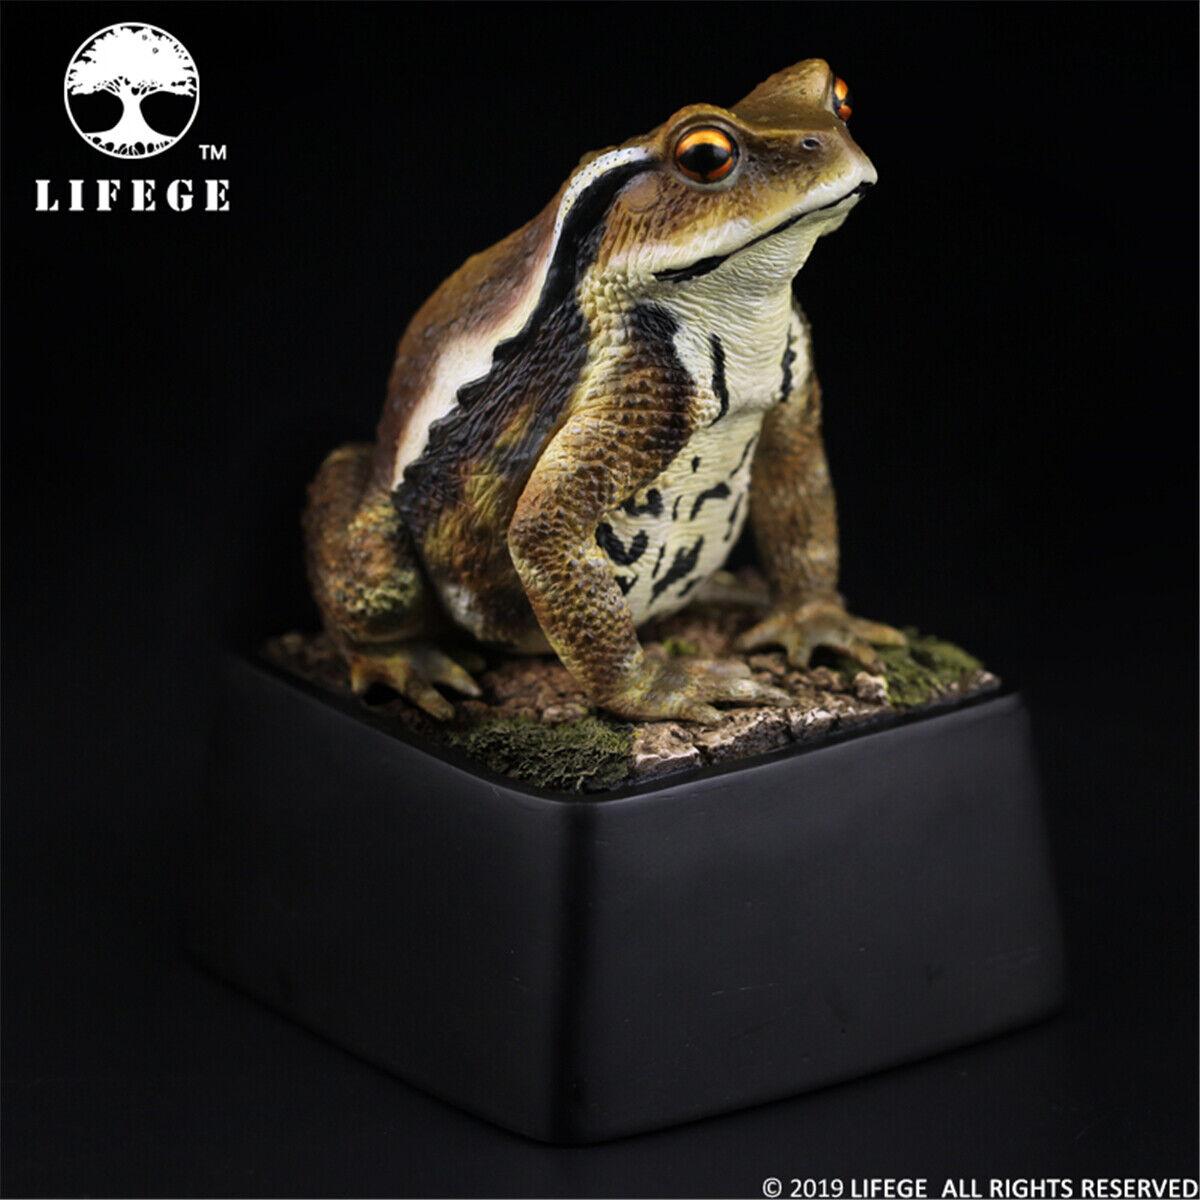 Lifege 1 1 bufo japonicus biología estatua Sapo Juguete de coleccionista de animales salvajes Preventa